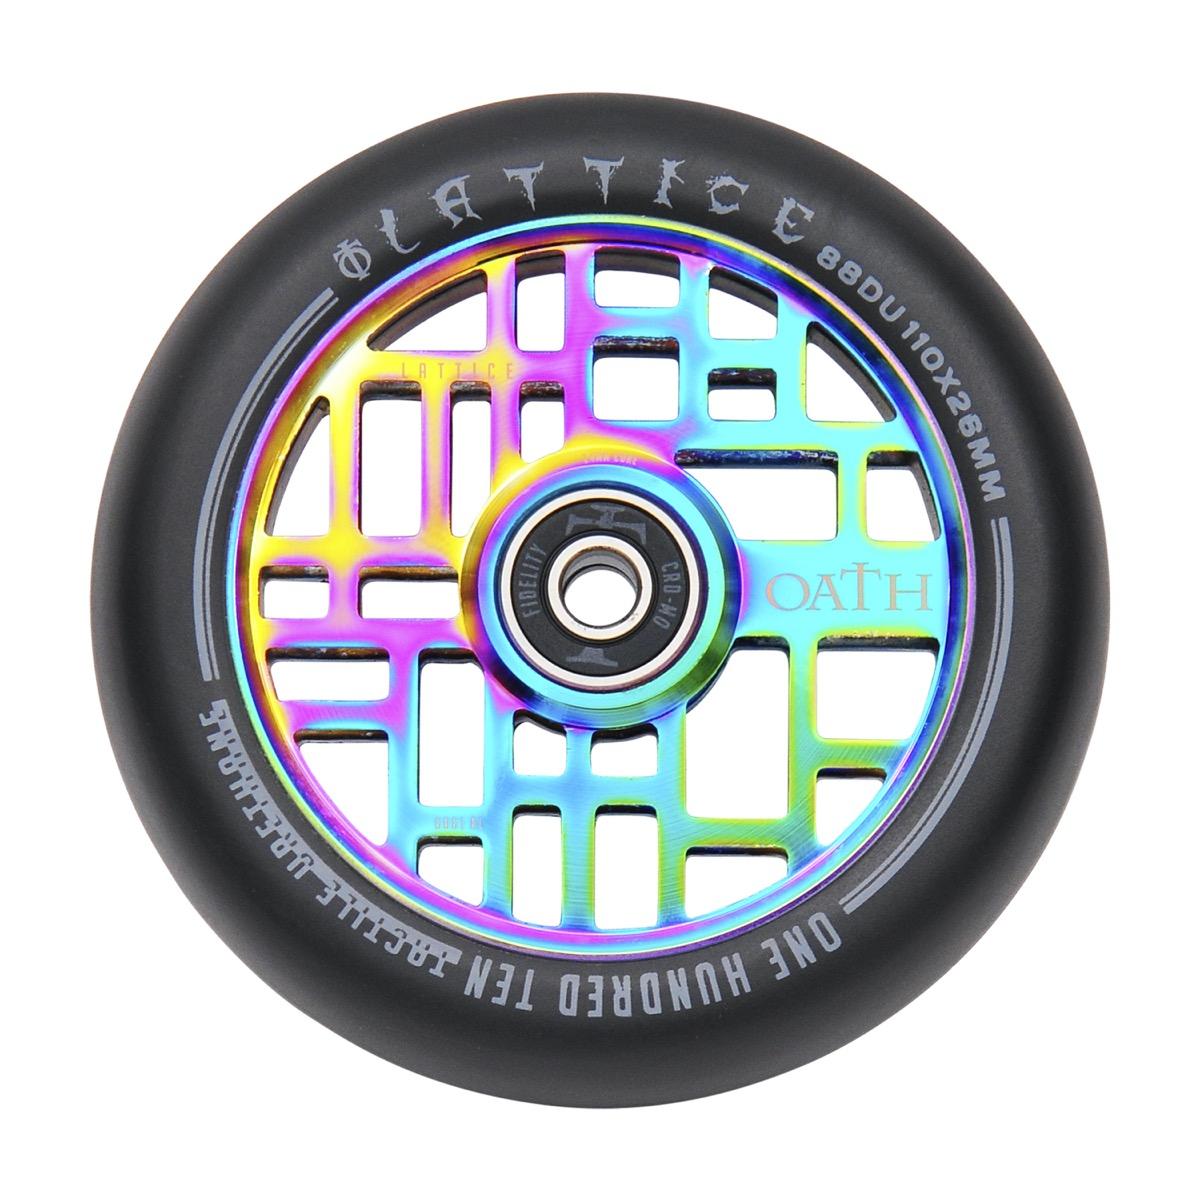 Oath Lattice 110mm Stunt Scooter Wheels